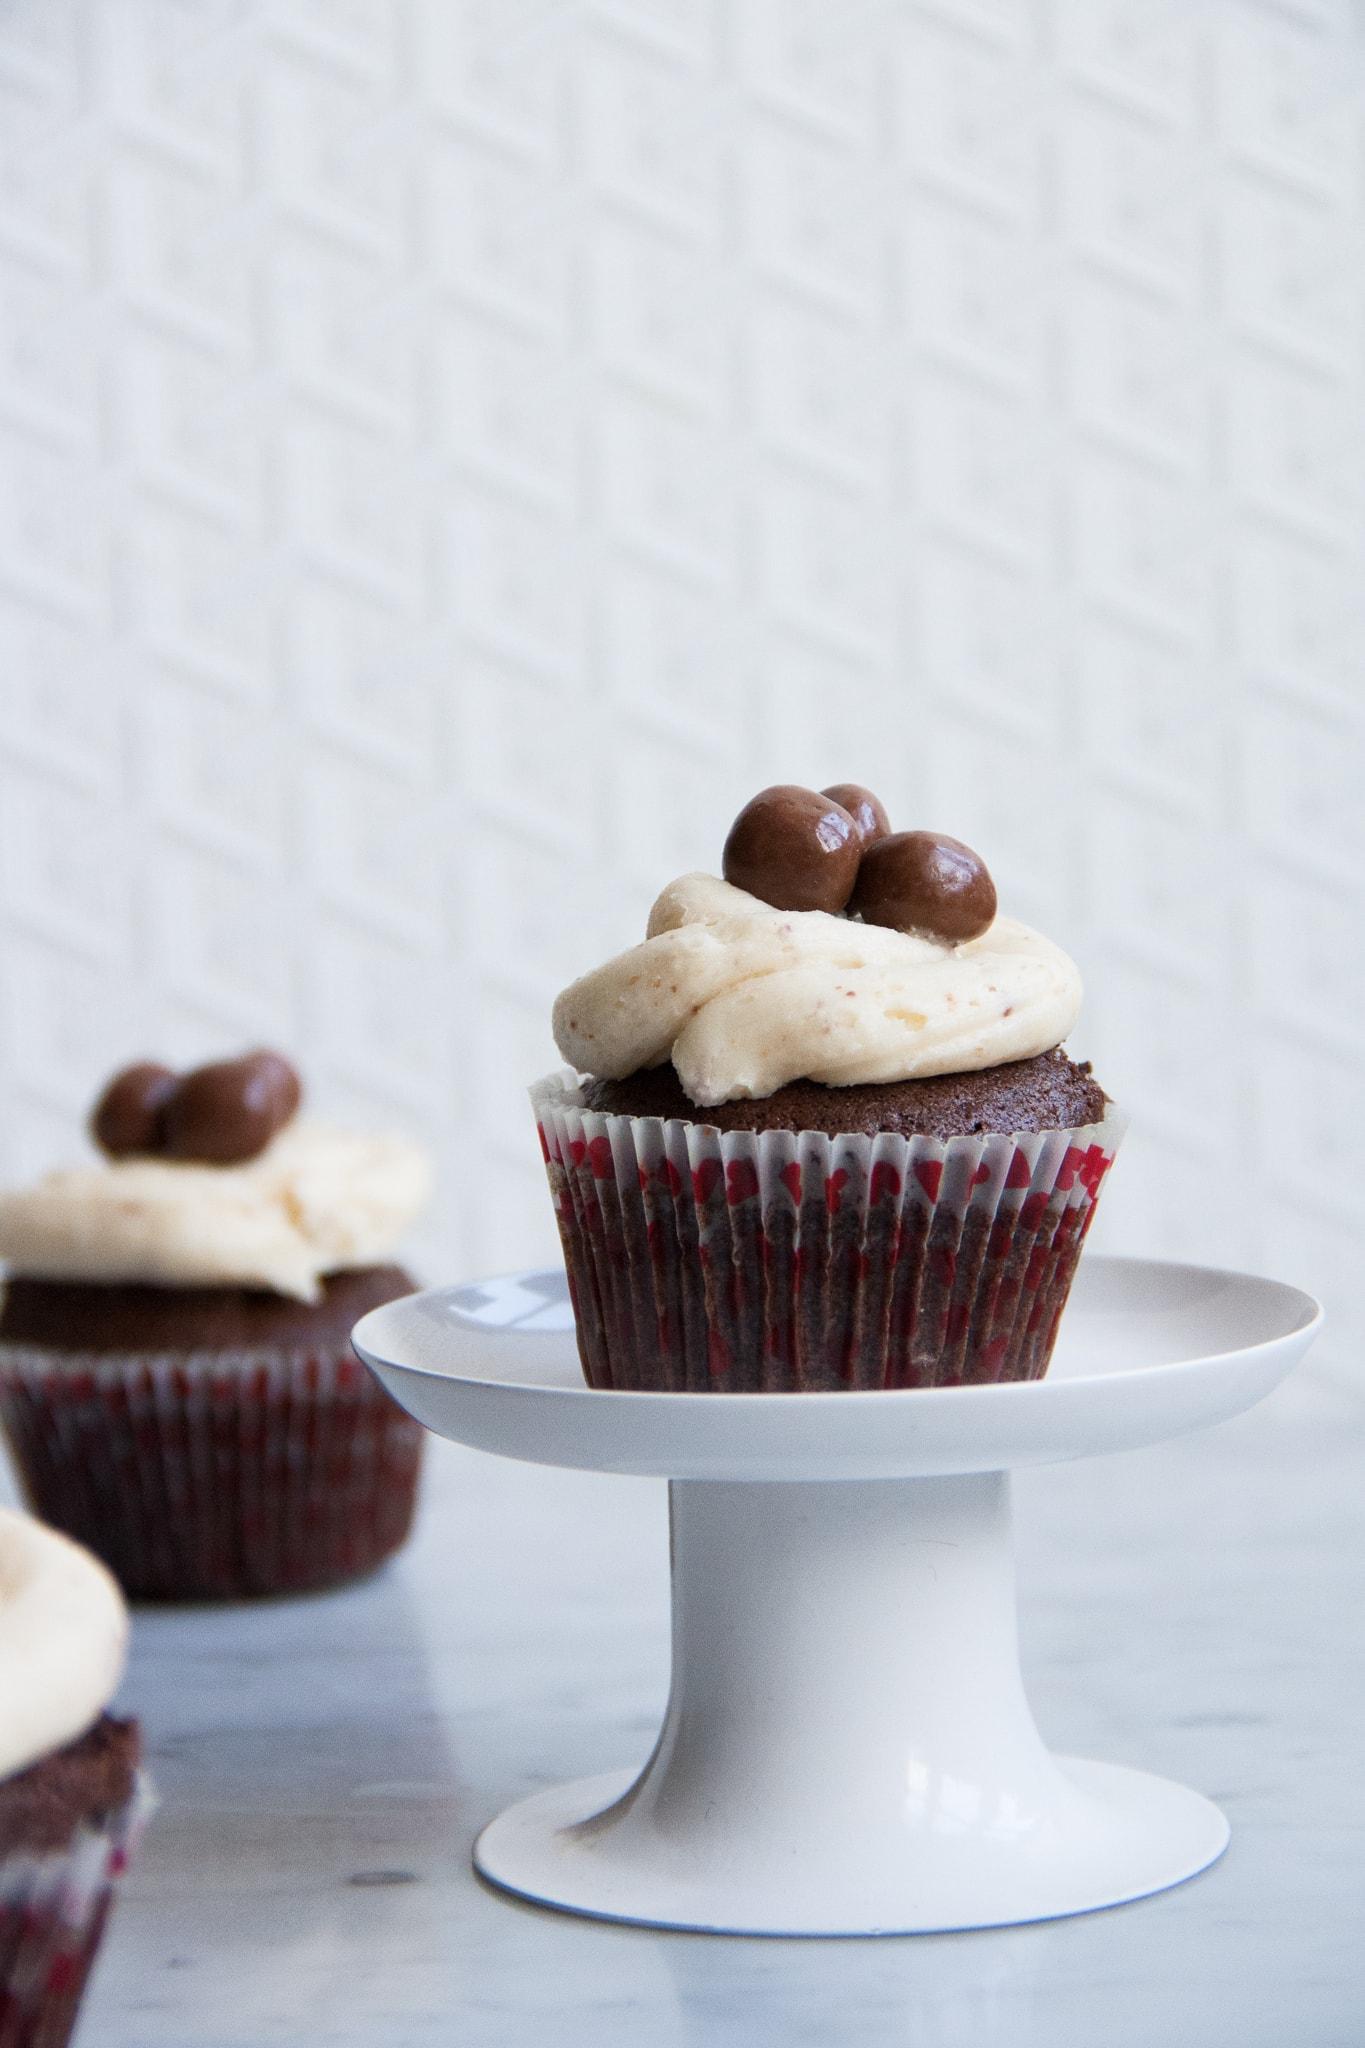 IMG 4163 - Recept Chocolade Cupcakes